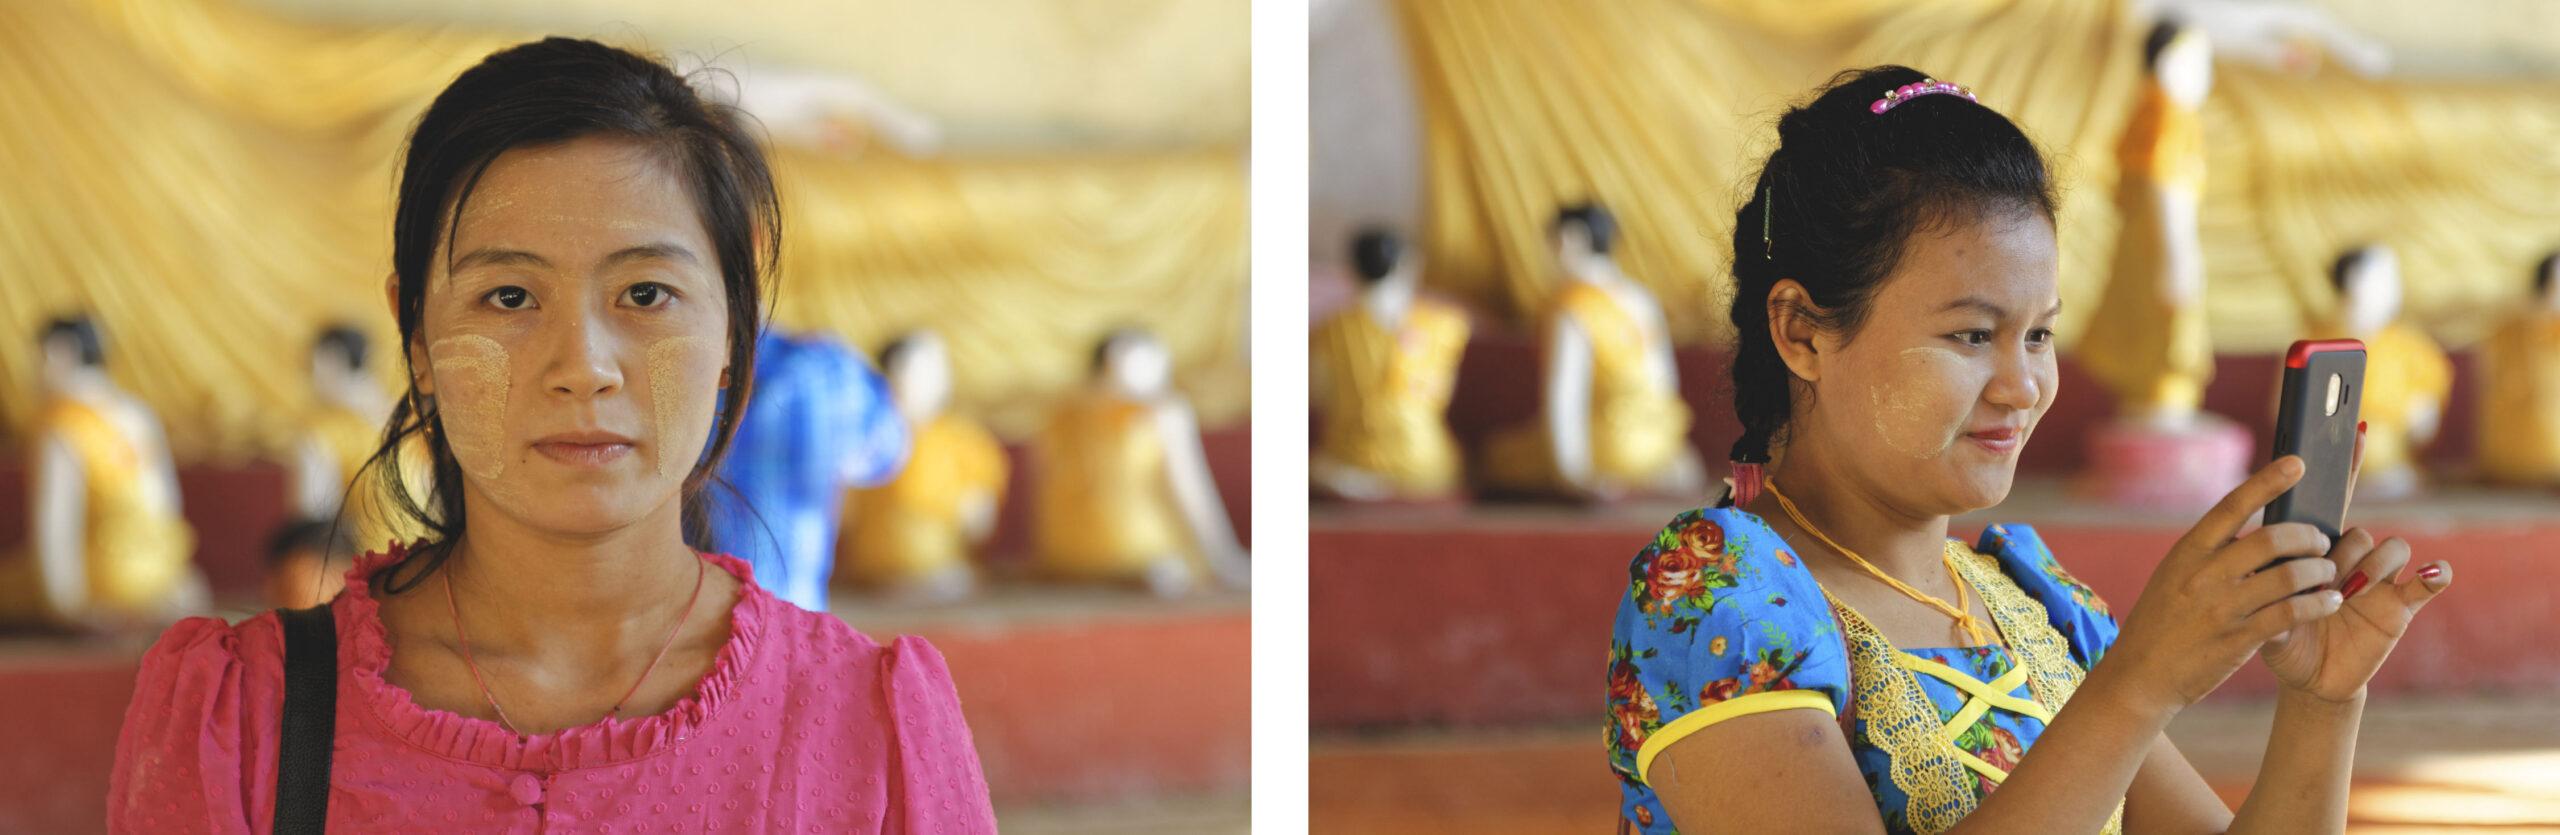 Portraits de jeunes Birmanes